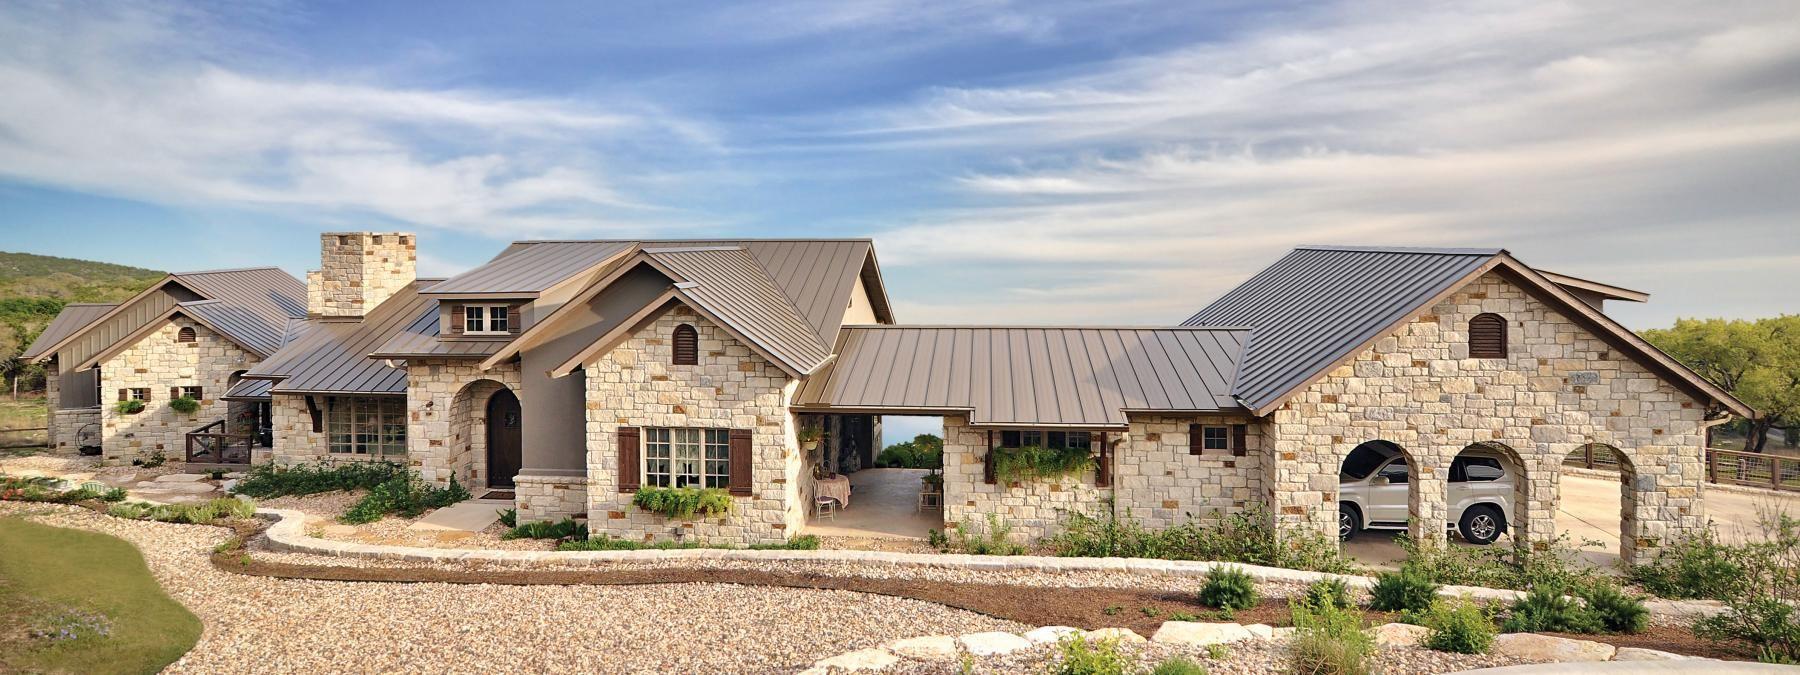 Best Welcome Drexel Metals Brown Roofs Corrugated Metal Roof 400 x 300